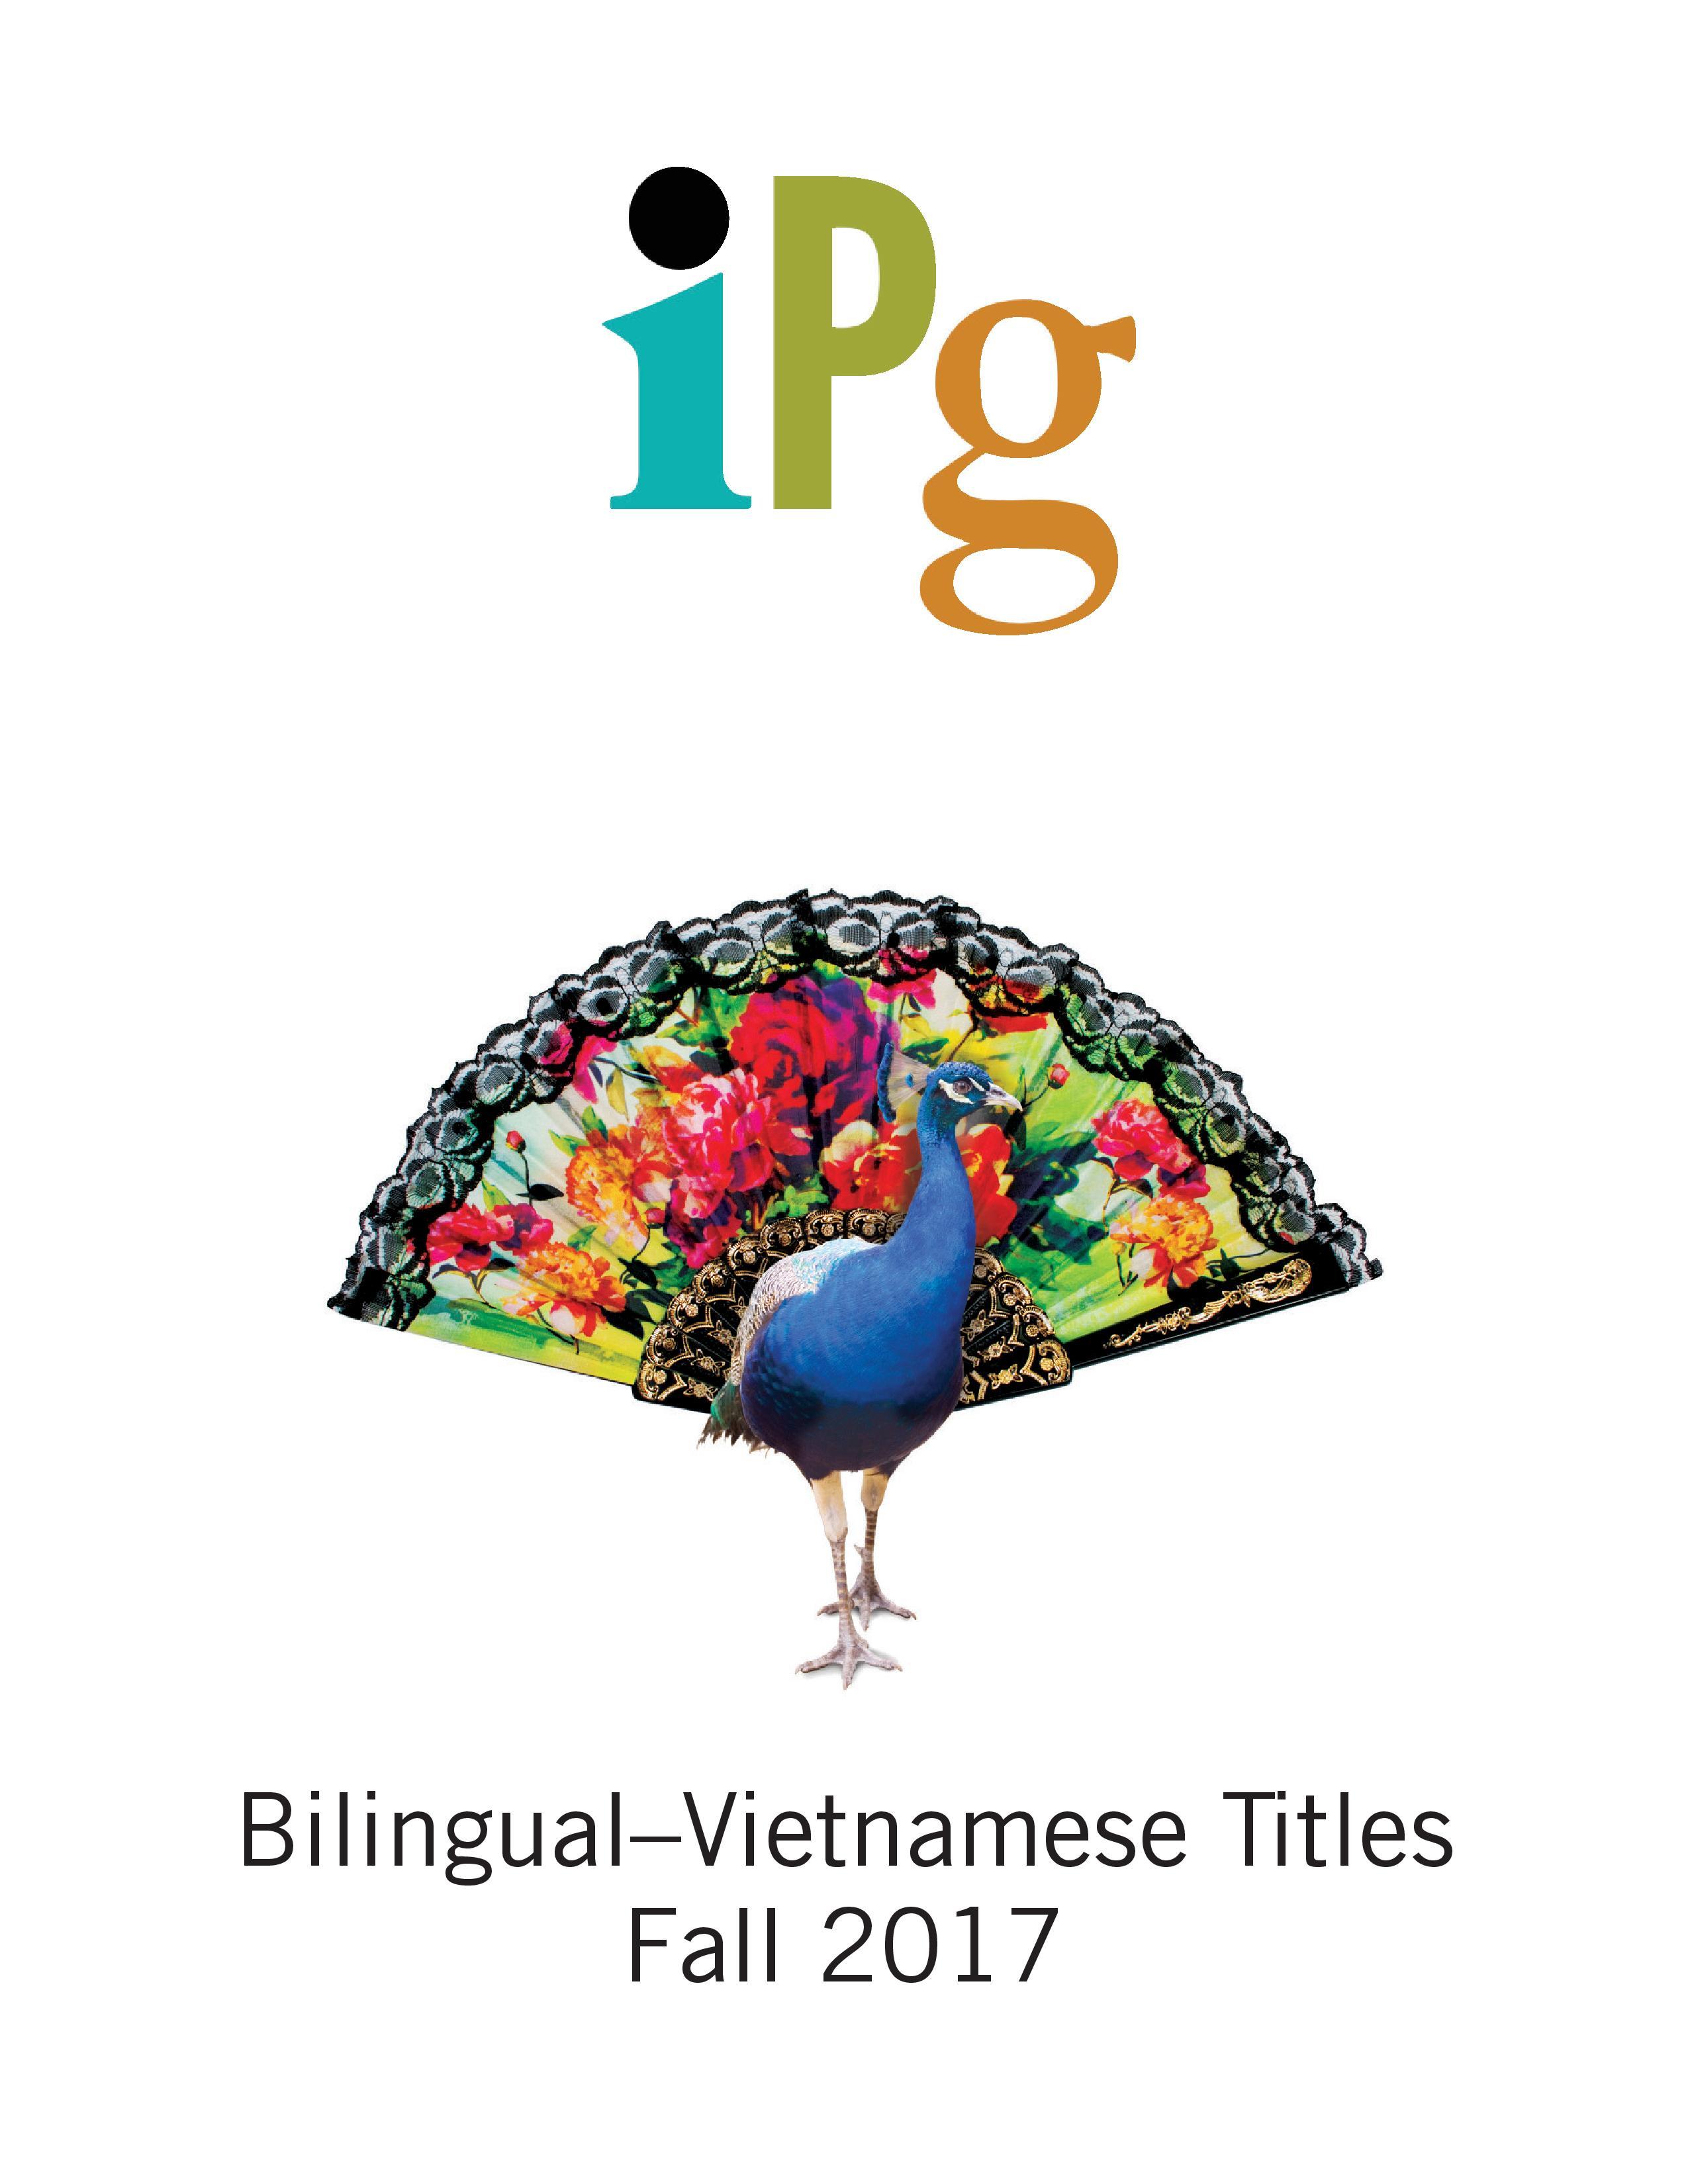 Bilingual Vietnamese Titles